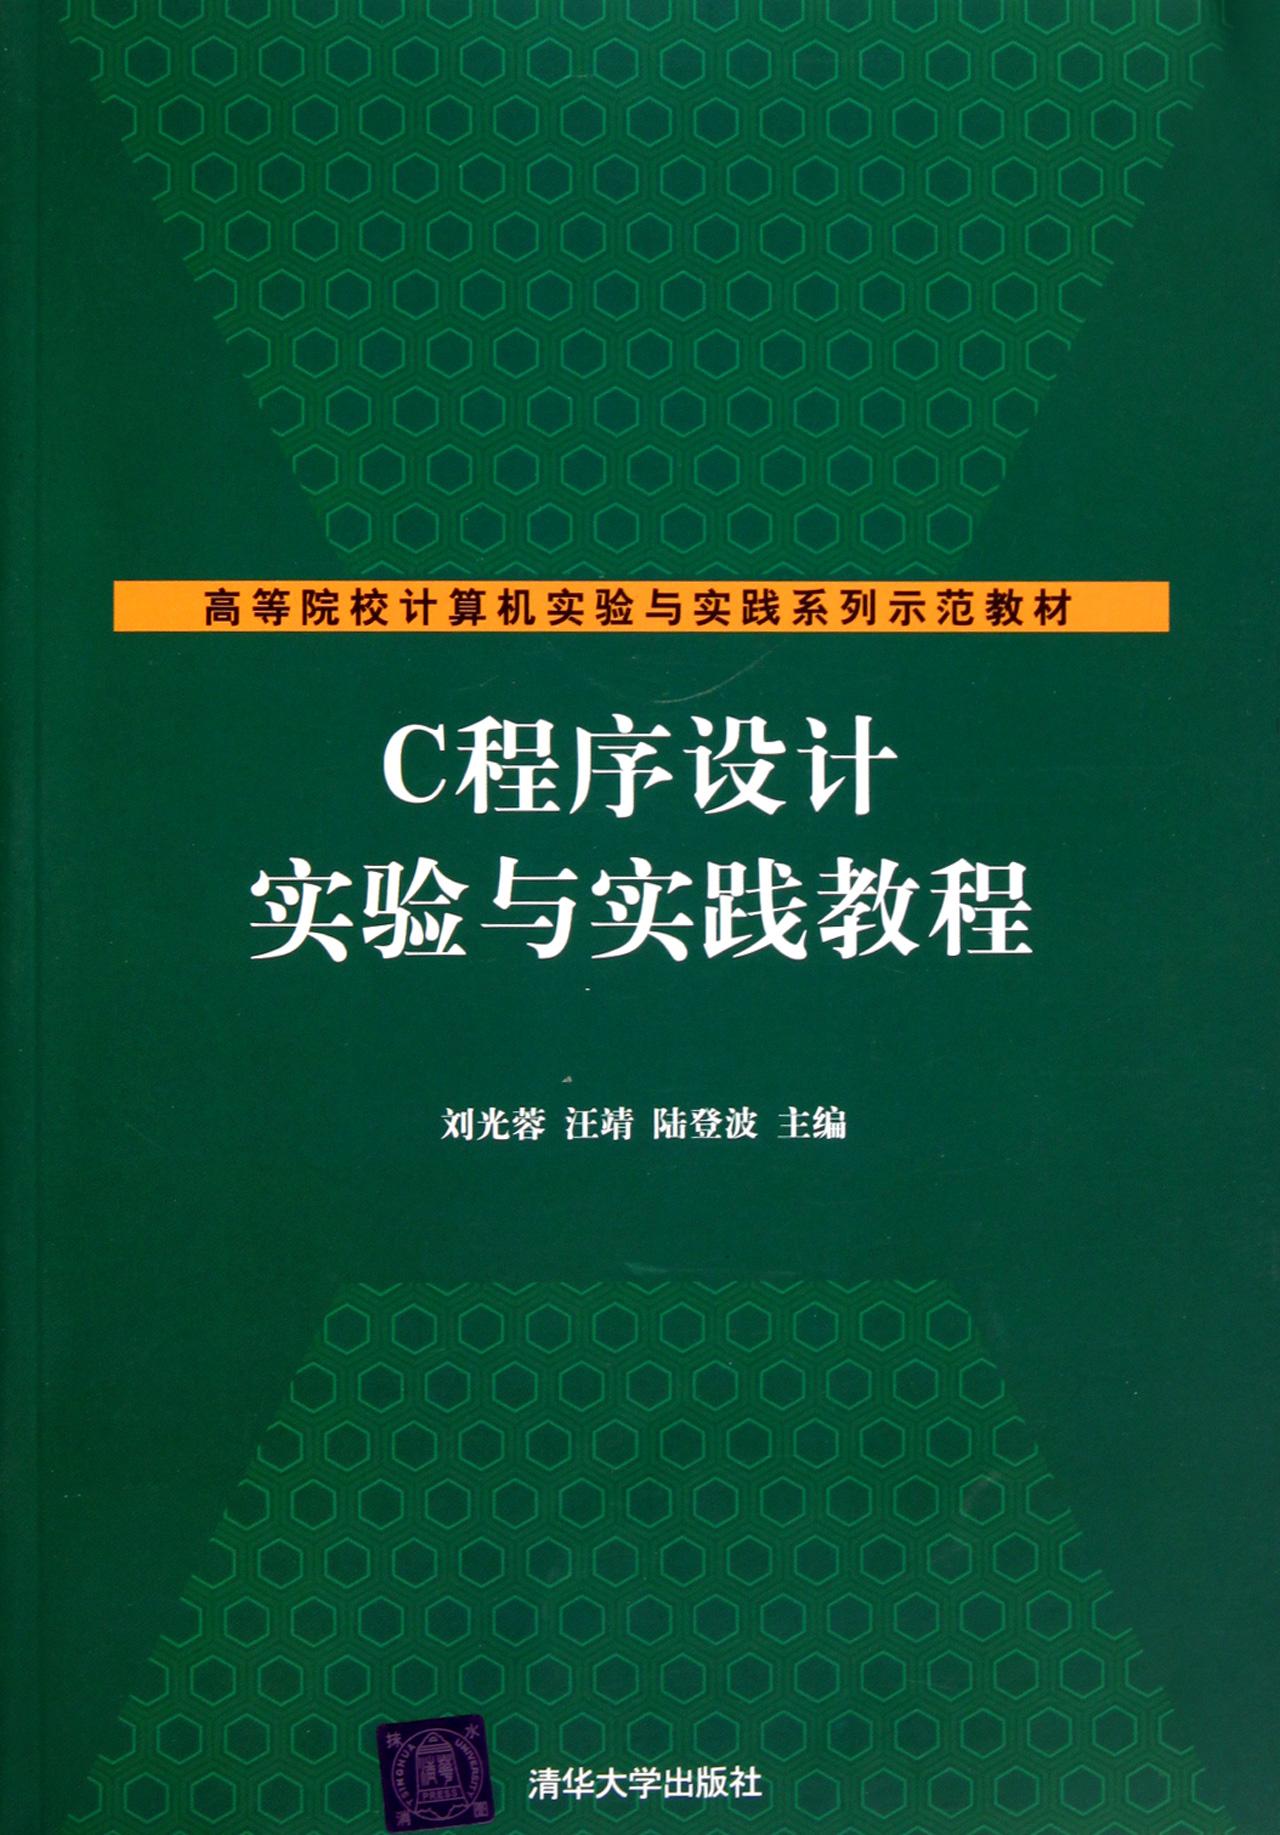 《C语言程序设计(第2版普通高等院校计算机科学与技术十二五规划教材)》编著者葛日波、何毅、刘丽艳、付蓉。 《C语言程序设计(第2版普通高等院校计算机科学与技术十二五规划教材)》是以C语言零起点读者作为主要对象的程序设计教程。2008年8月出版了第1版,本次再版融入了新的教学与改革成果,更加突.出了教师方便教,学生容易学的特点。 本书紧密结合技术和应用背景,按照从问题中来~到问题中去的思路进行精心策划,用大量的图表和程序实例将知识融入其中,大大降低了知识的抽象性和复杂性,符合读者的认知规律,很容易入门